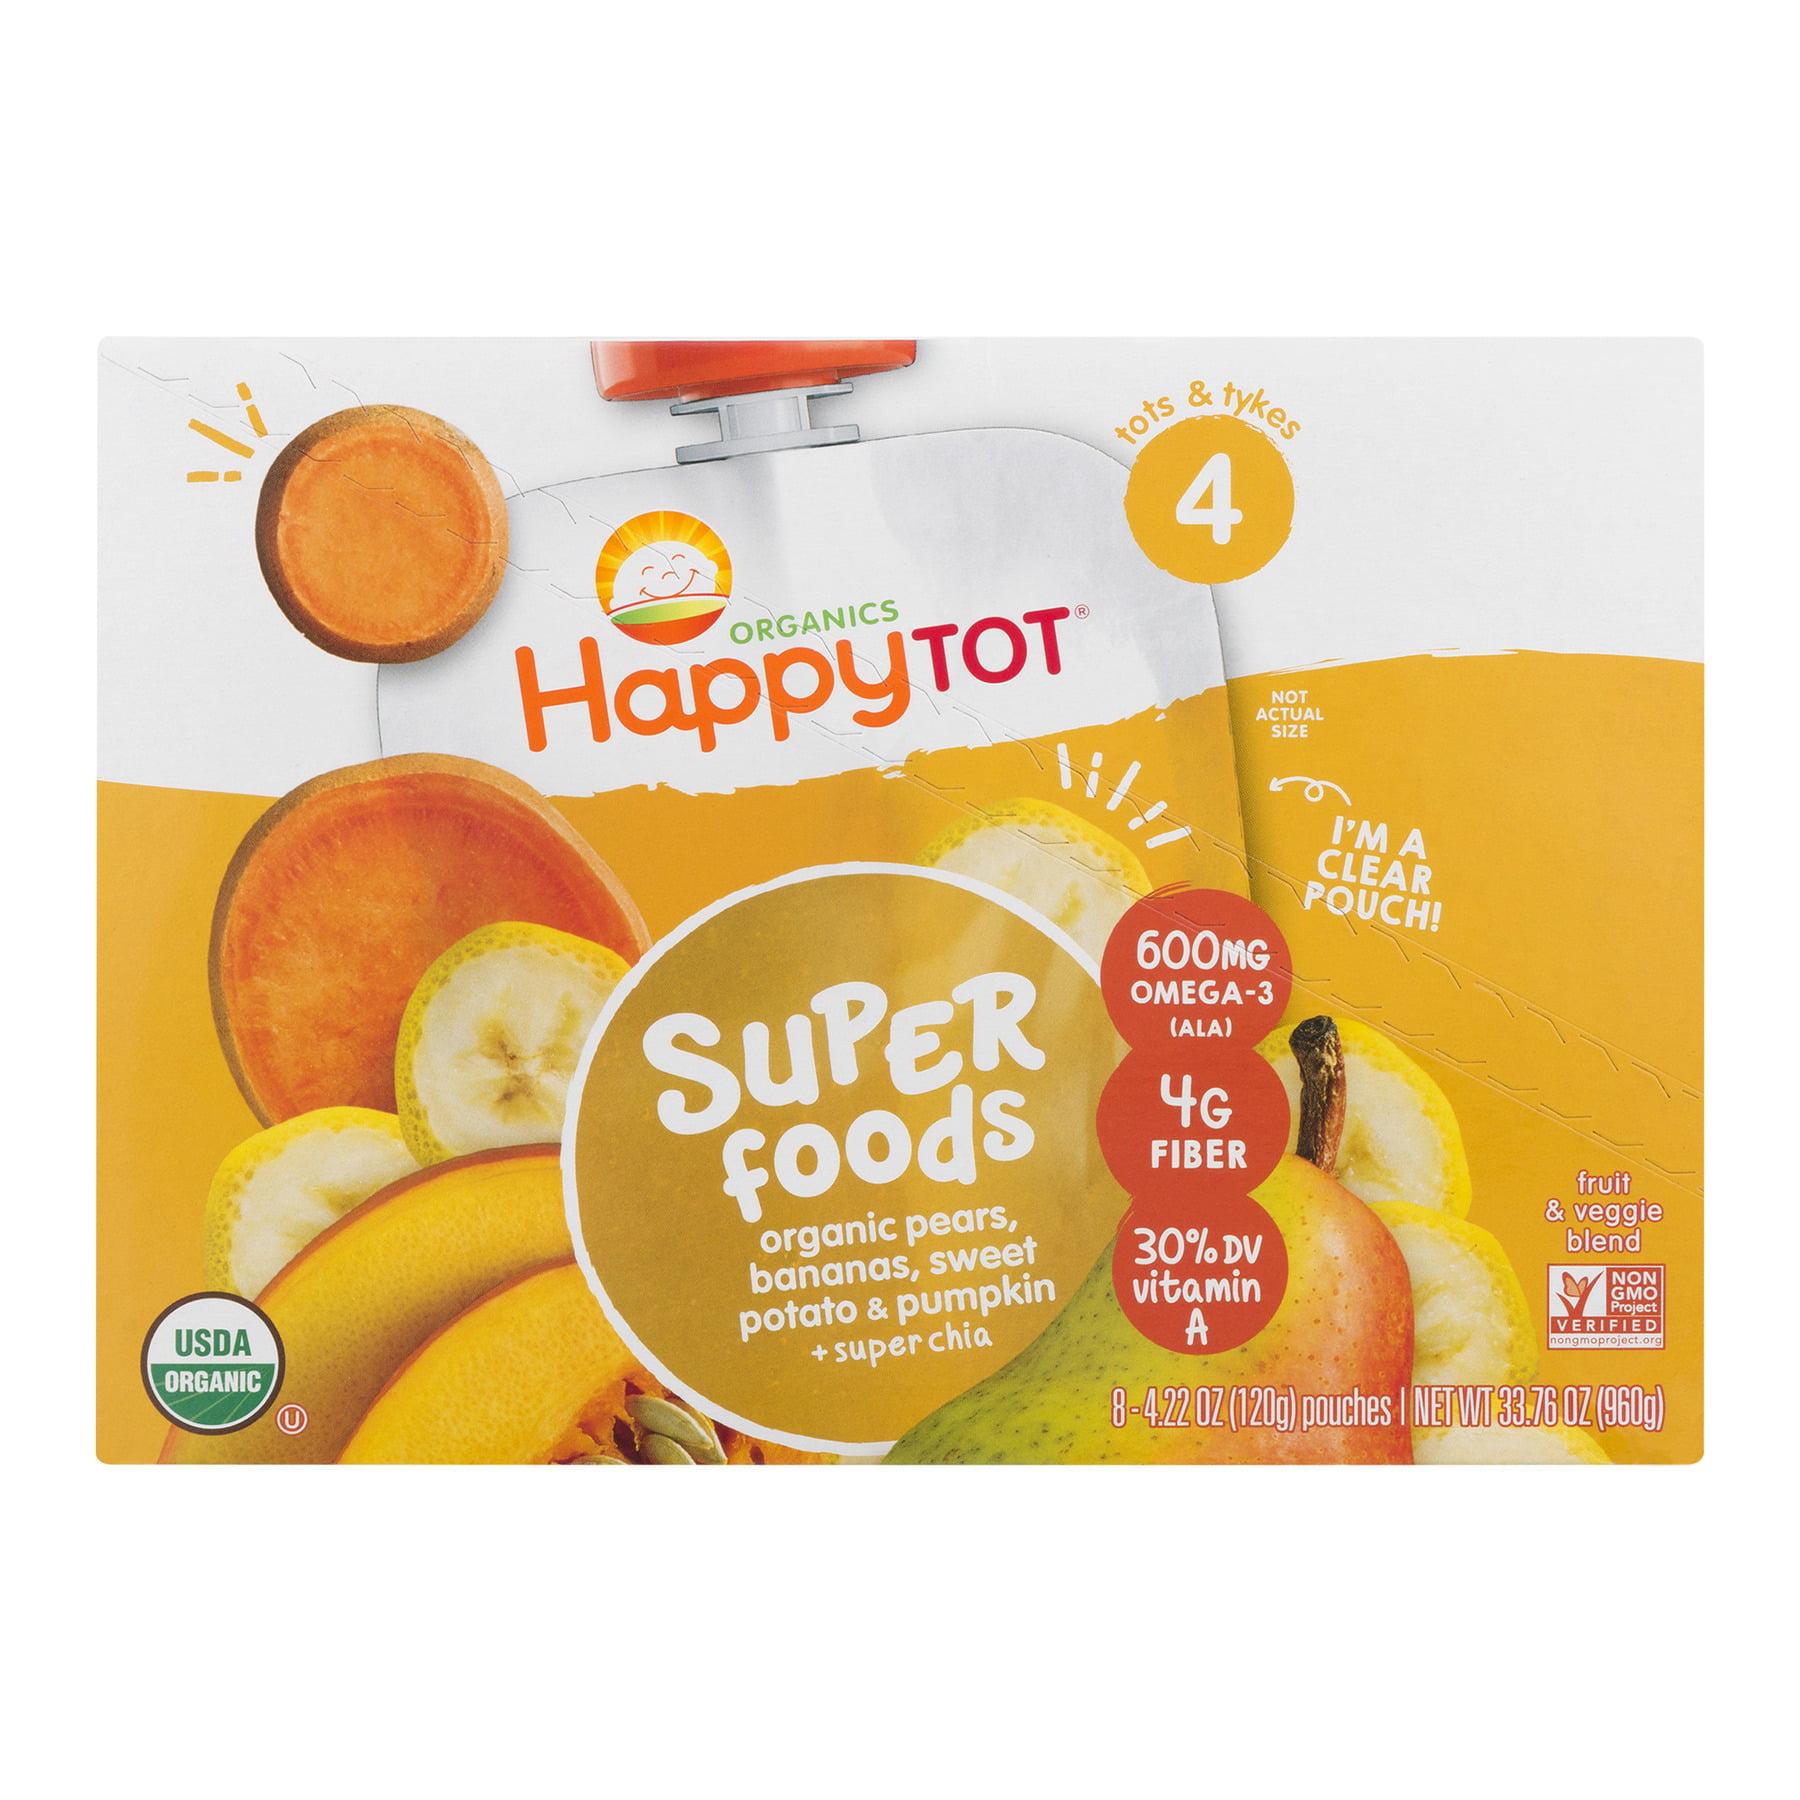 Happy Tot Super Foods Pouches Organic Pears, Bananas, Sweet Potato & Pumpkin + Super Chia, 4.22 OZ